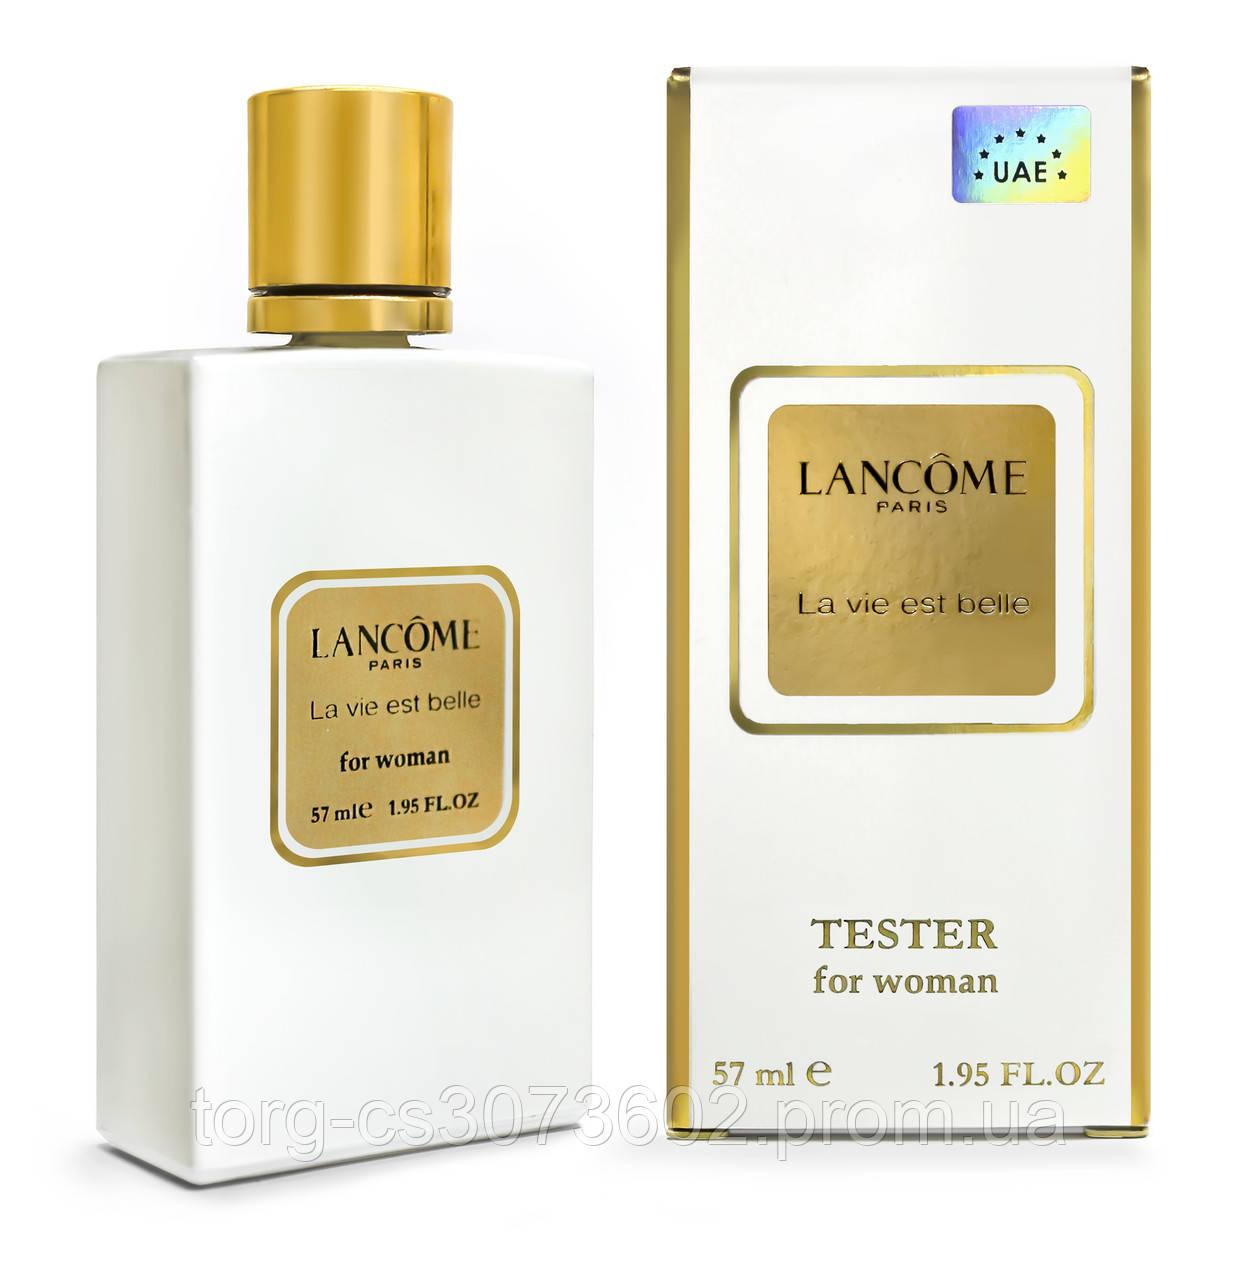 Тестер женский LANCOME LA VIE EST BELLE, 57 мл.